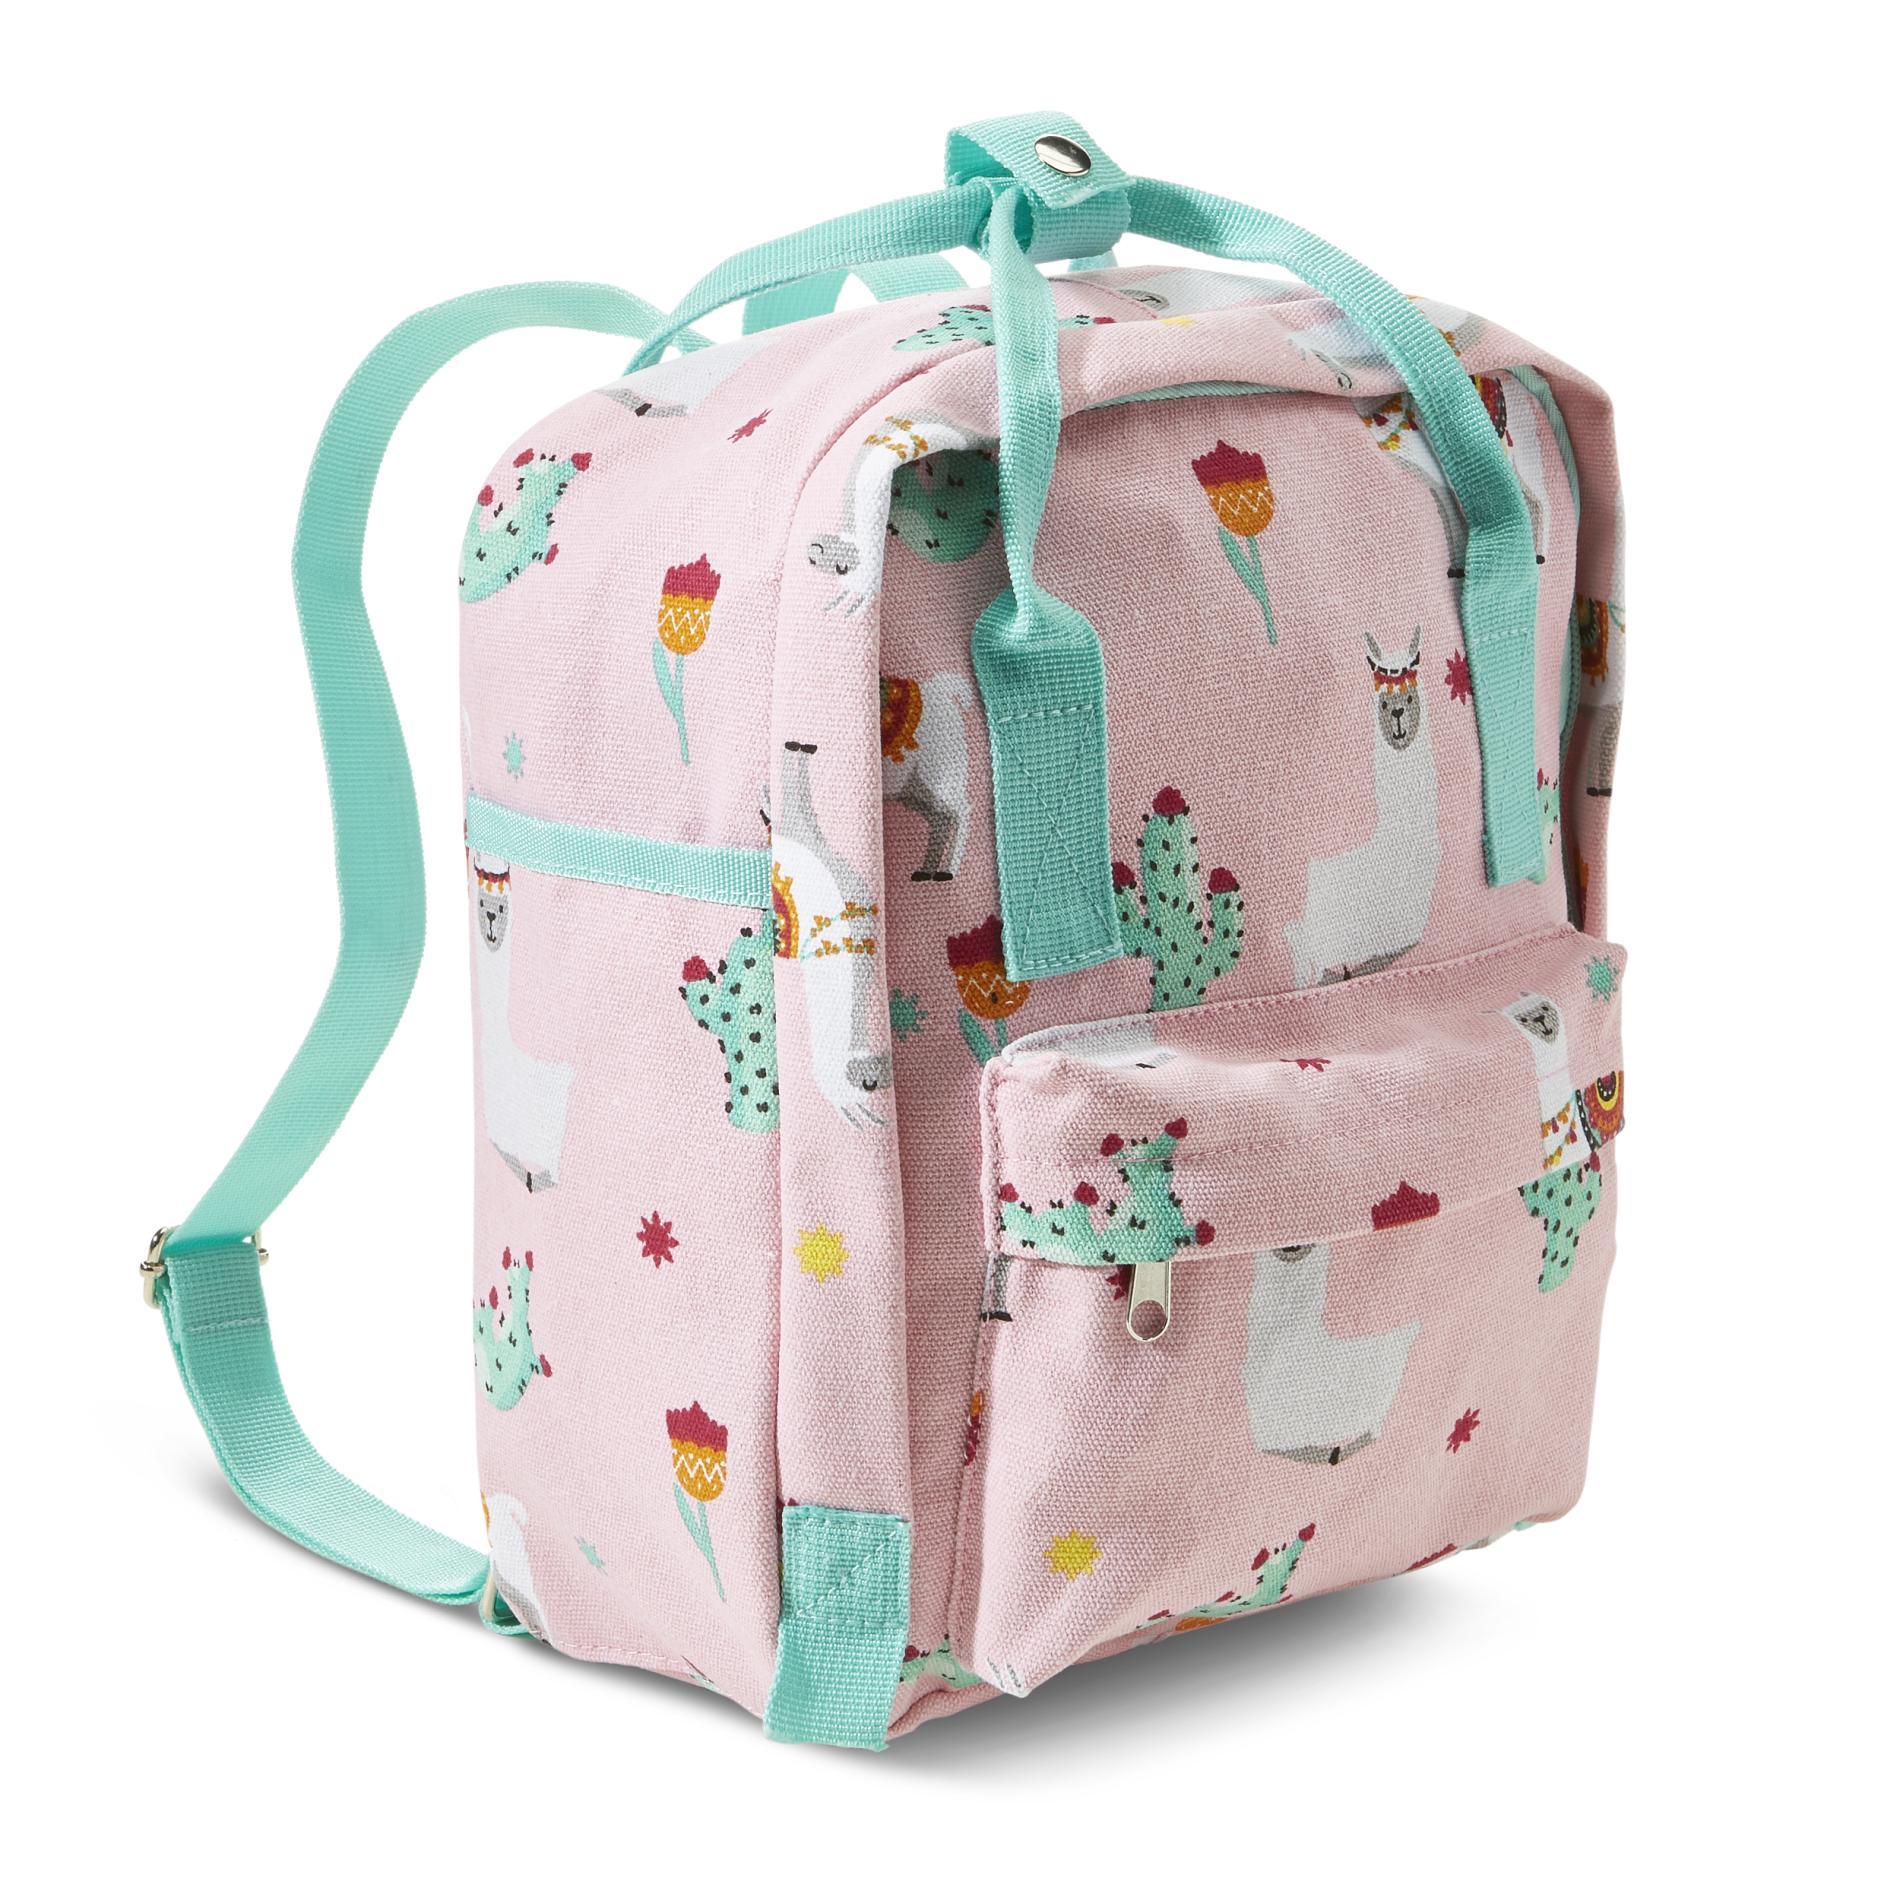 Juniors' Backpack Purse - Llama, Pink (030W001947403001 THB0164-K) photo